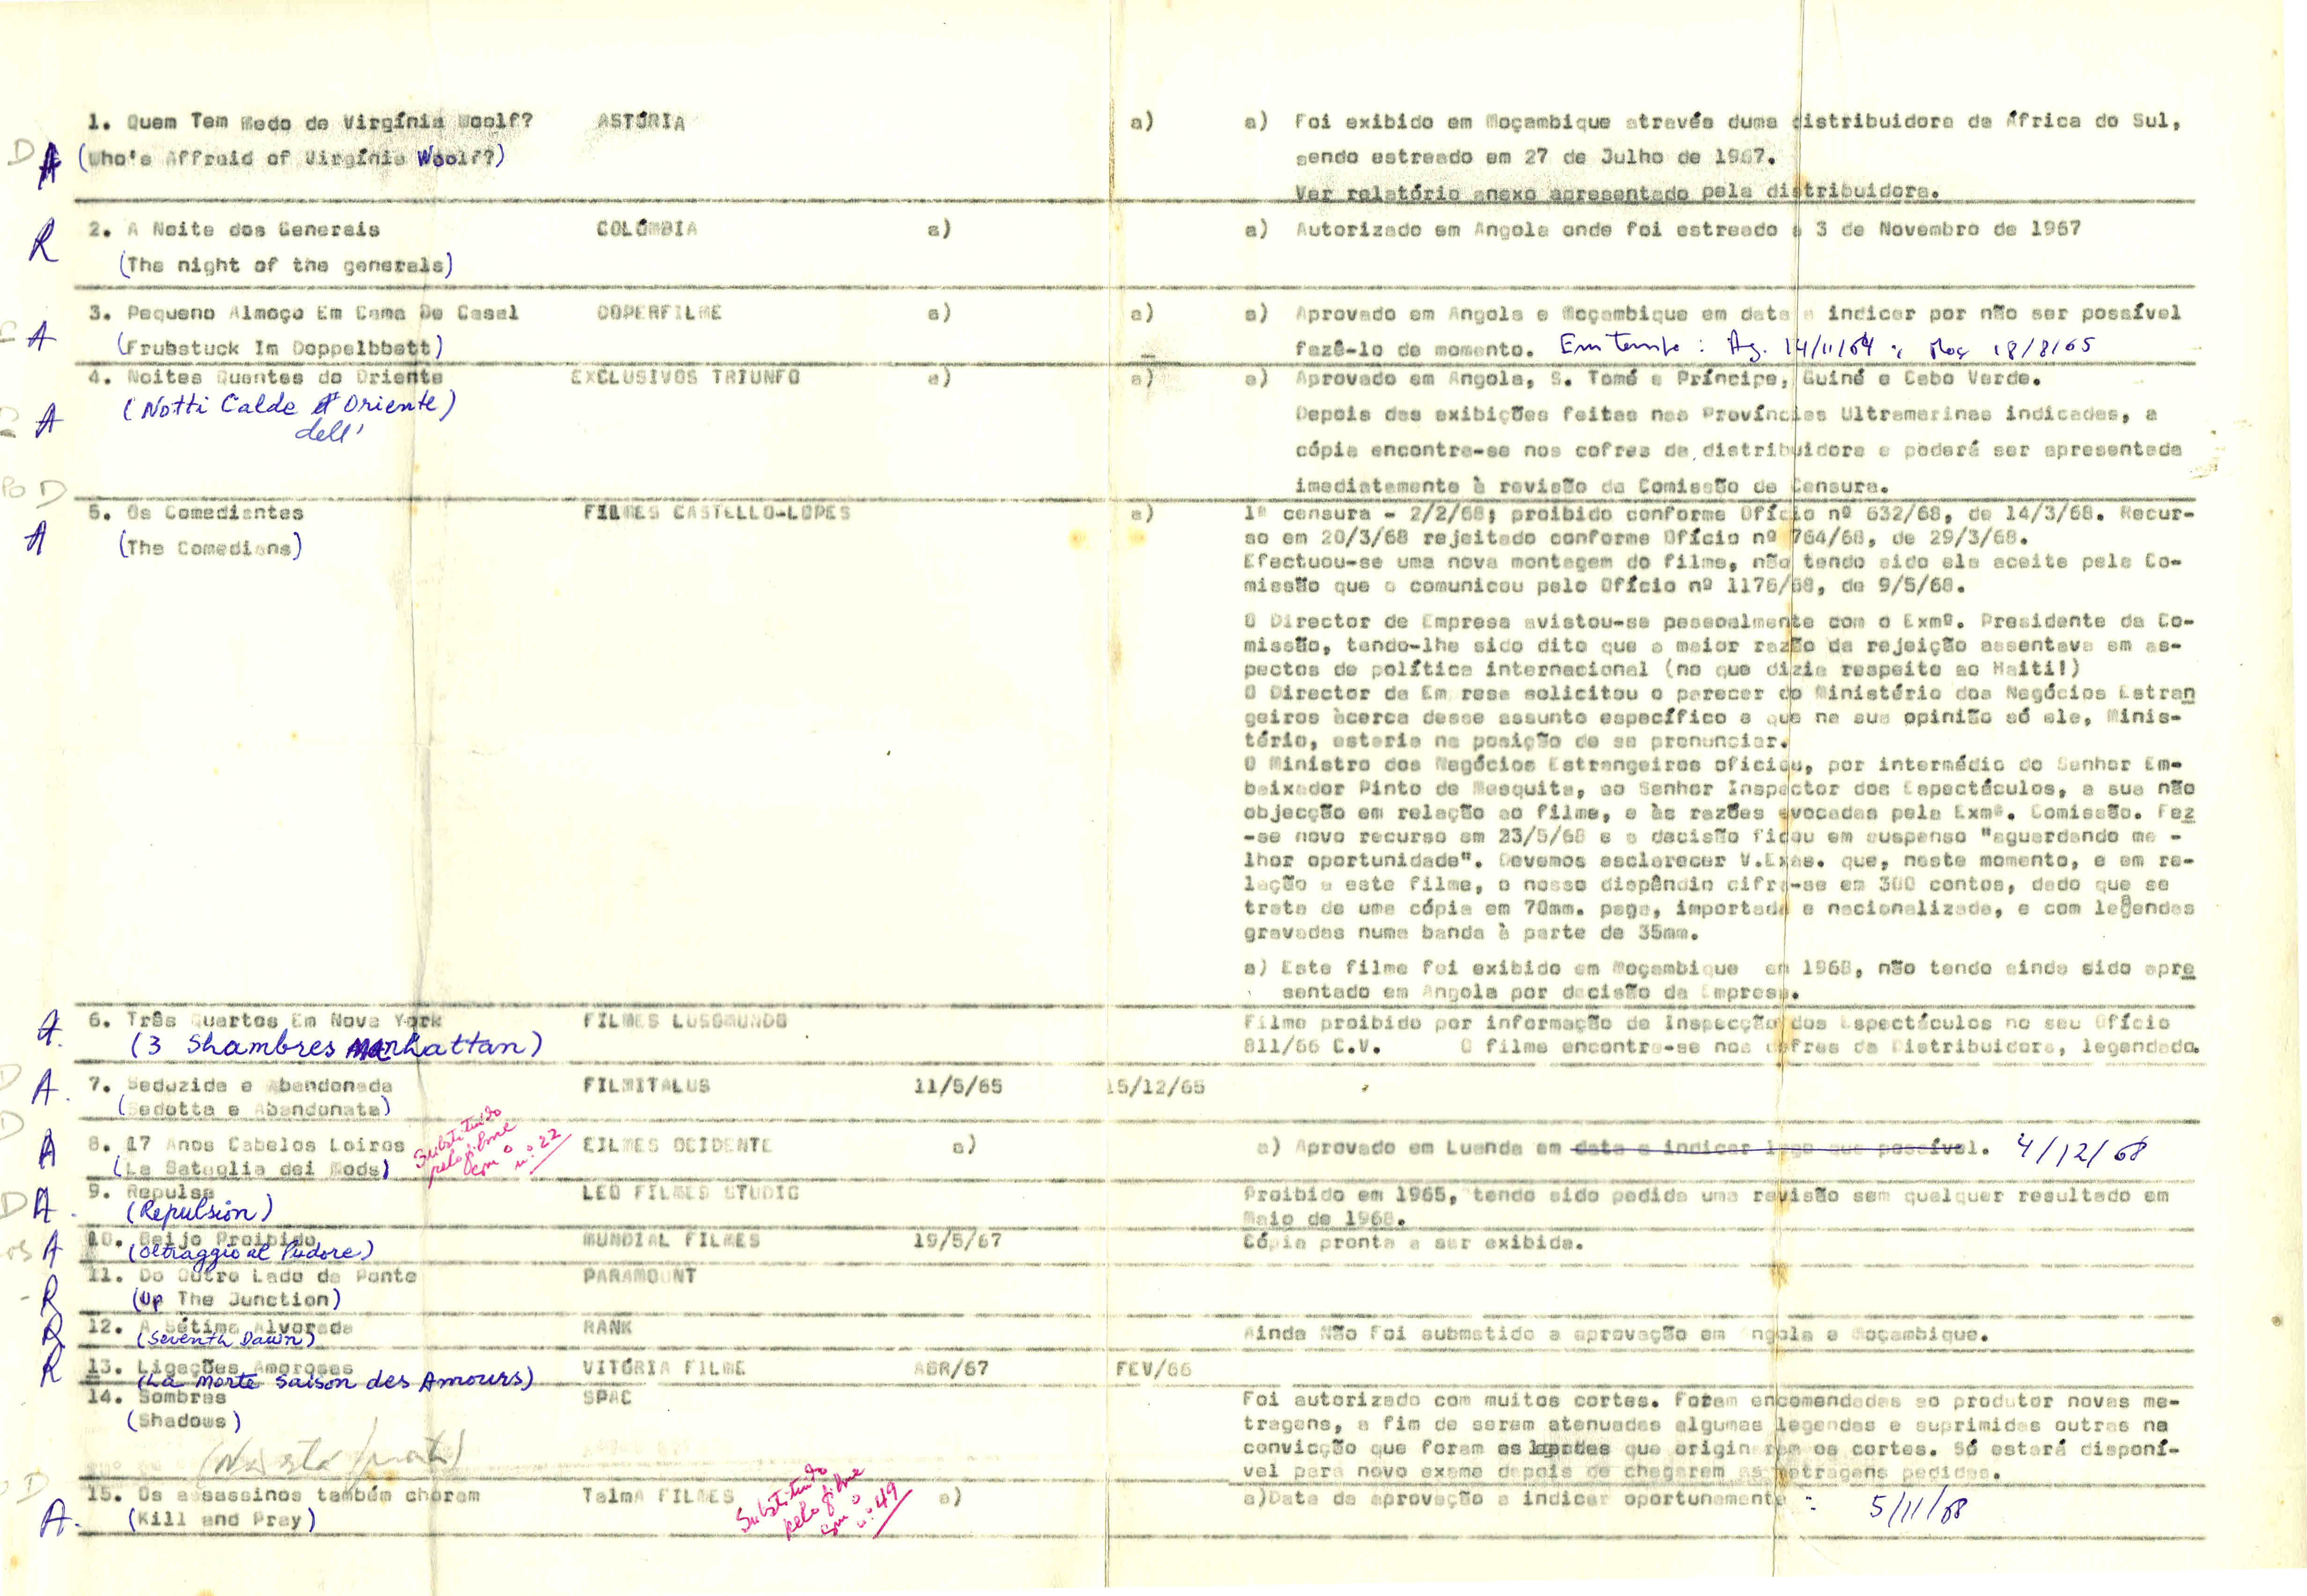 Copy of Document (27)jhdhdu (3)